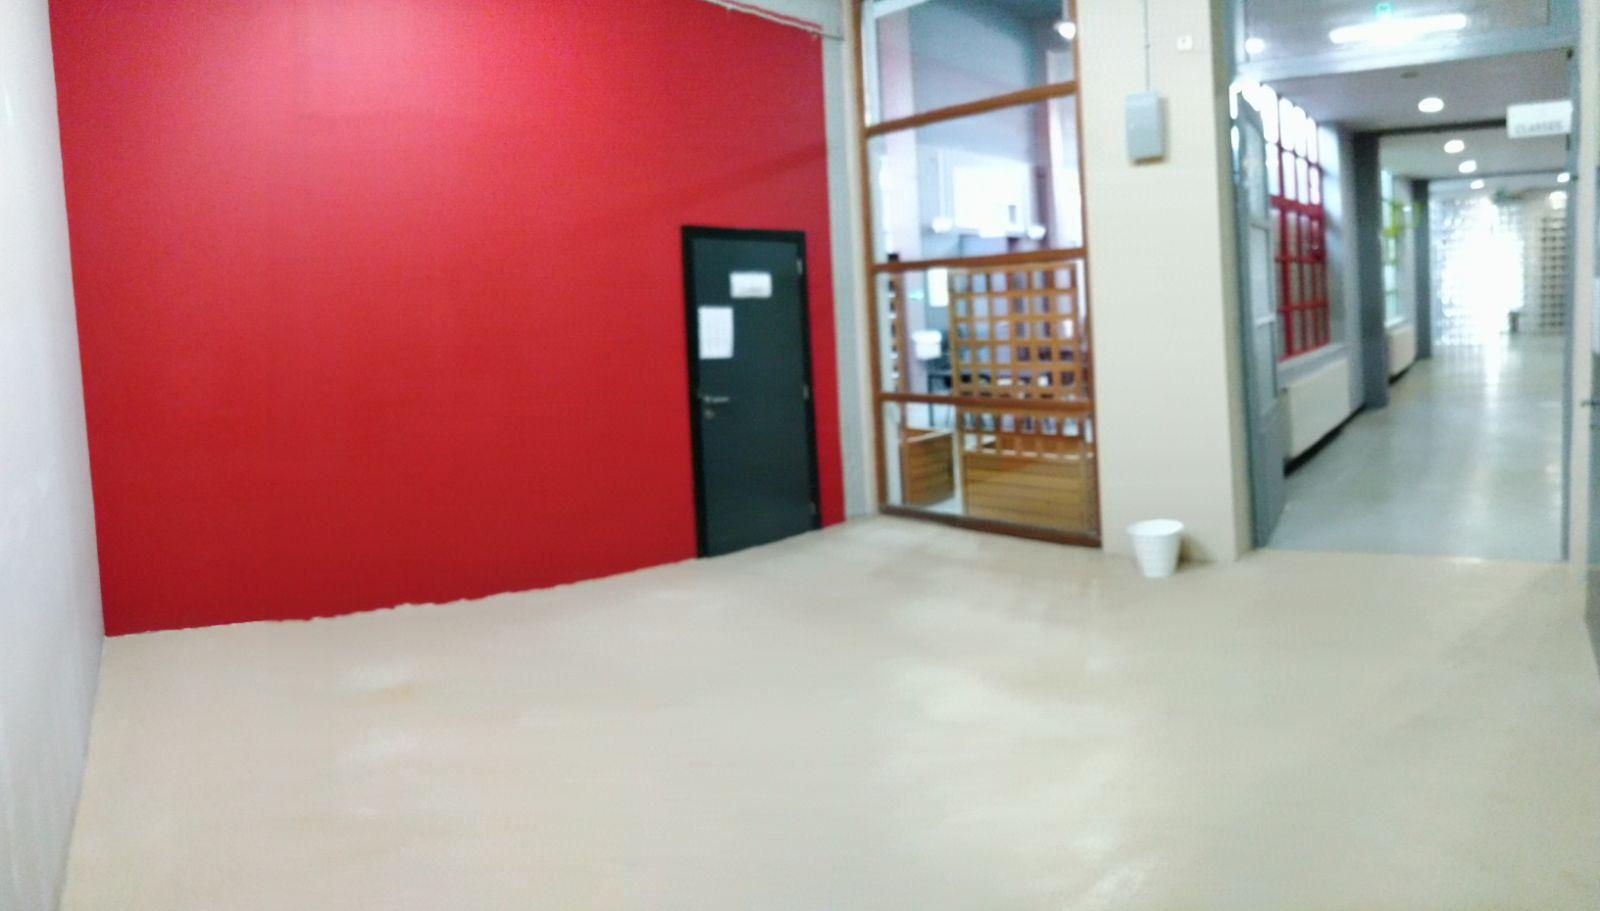 Hall classes